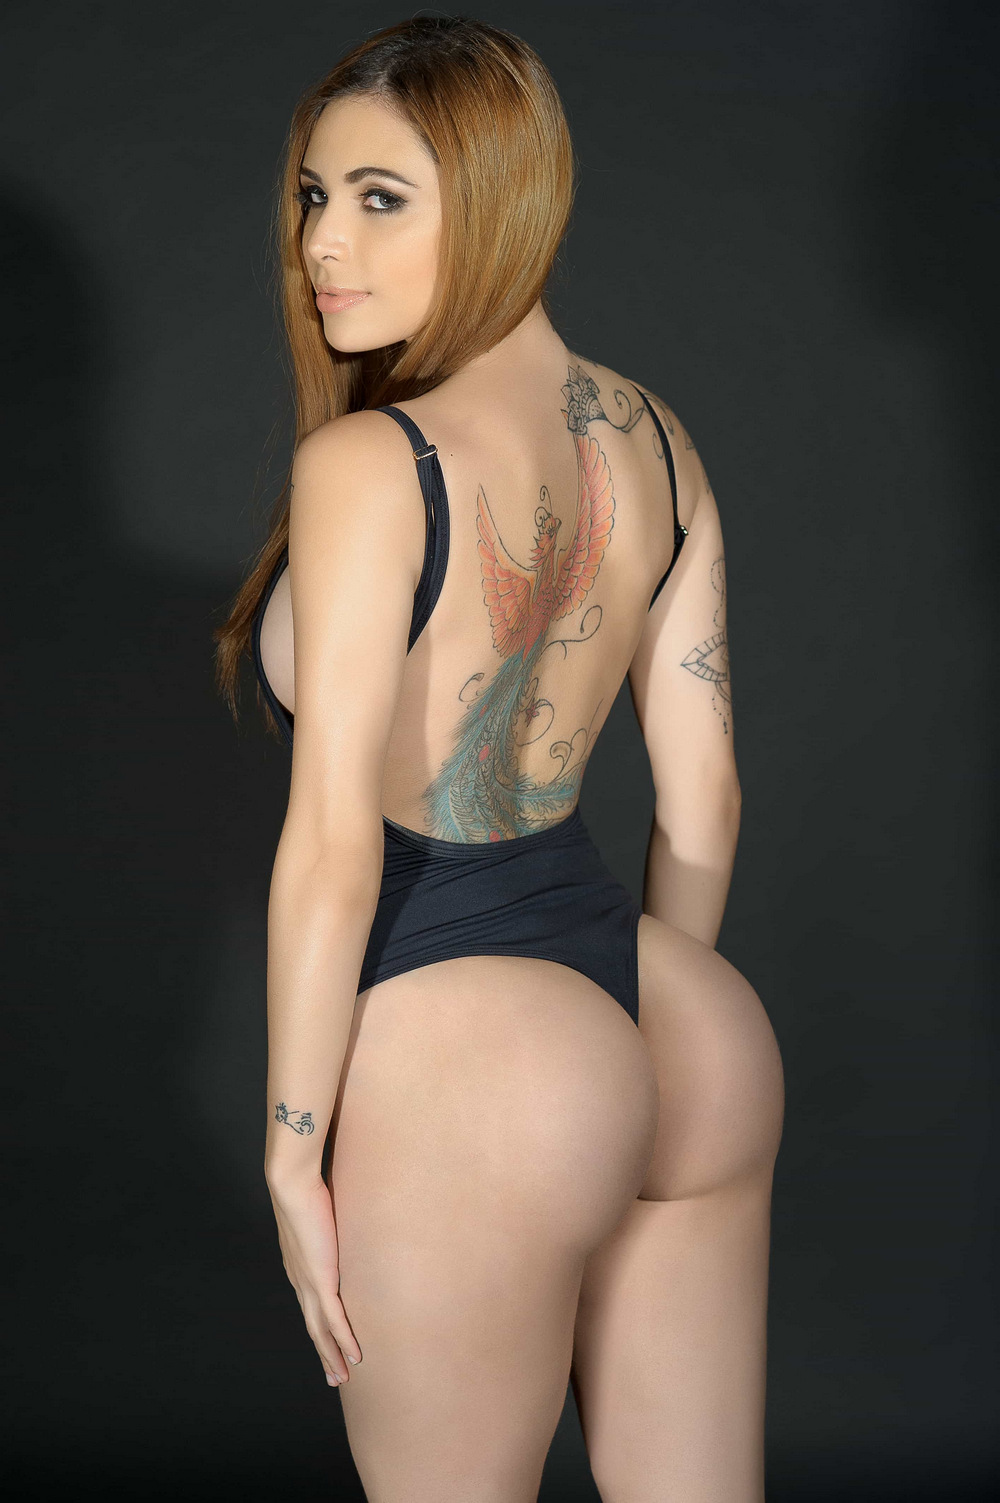 Gilliane